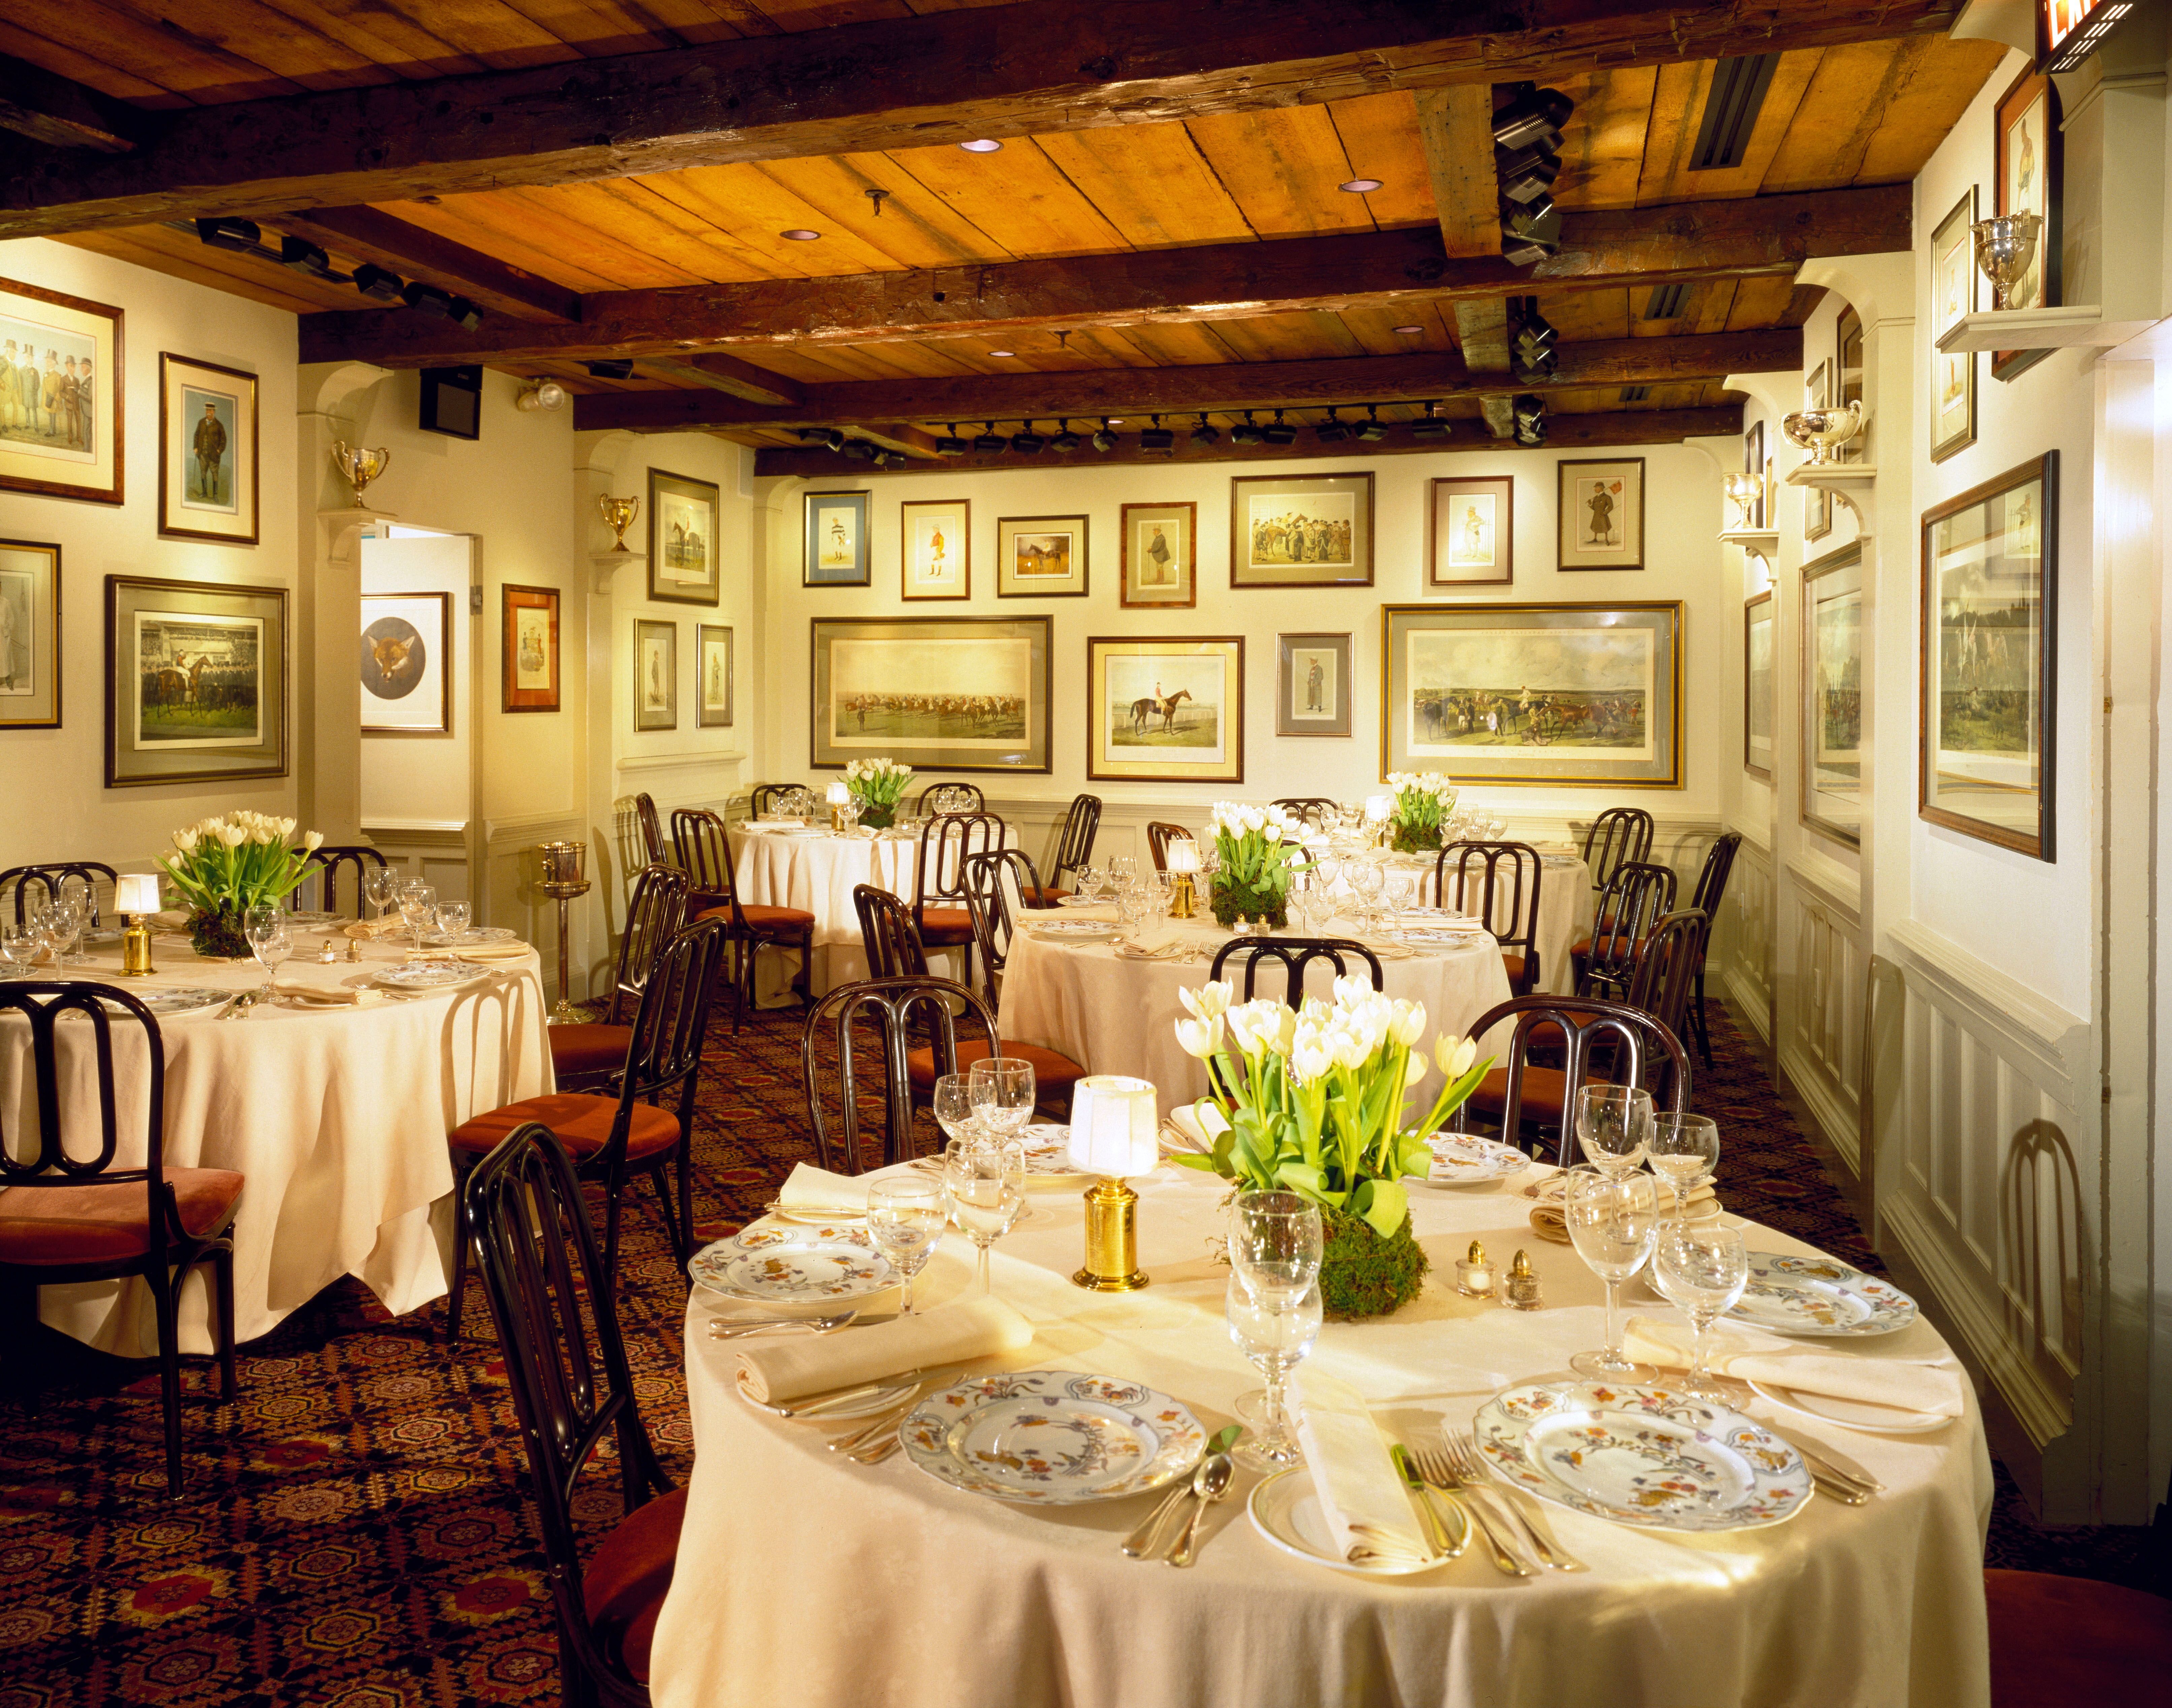 1789 Restaurant - WASHINGTON, DC